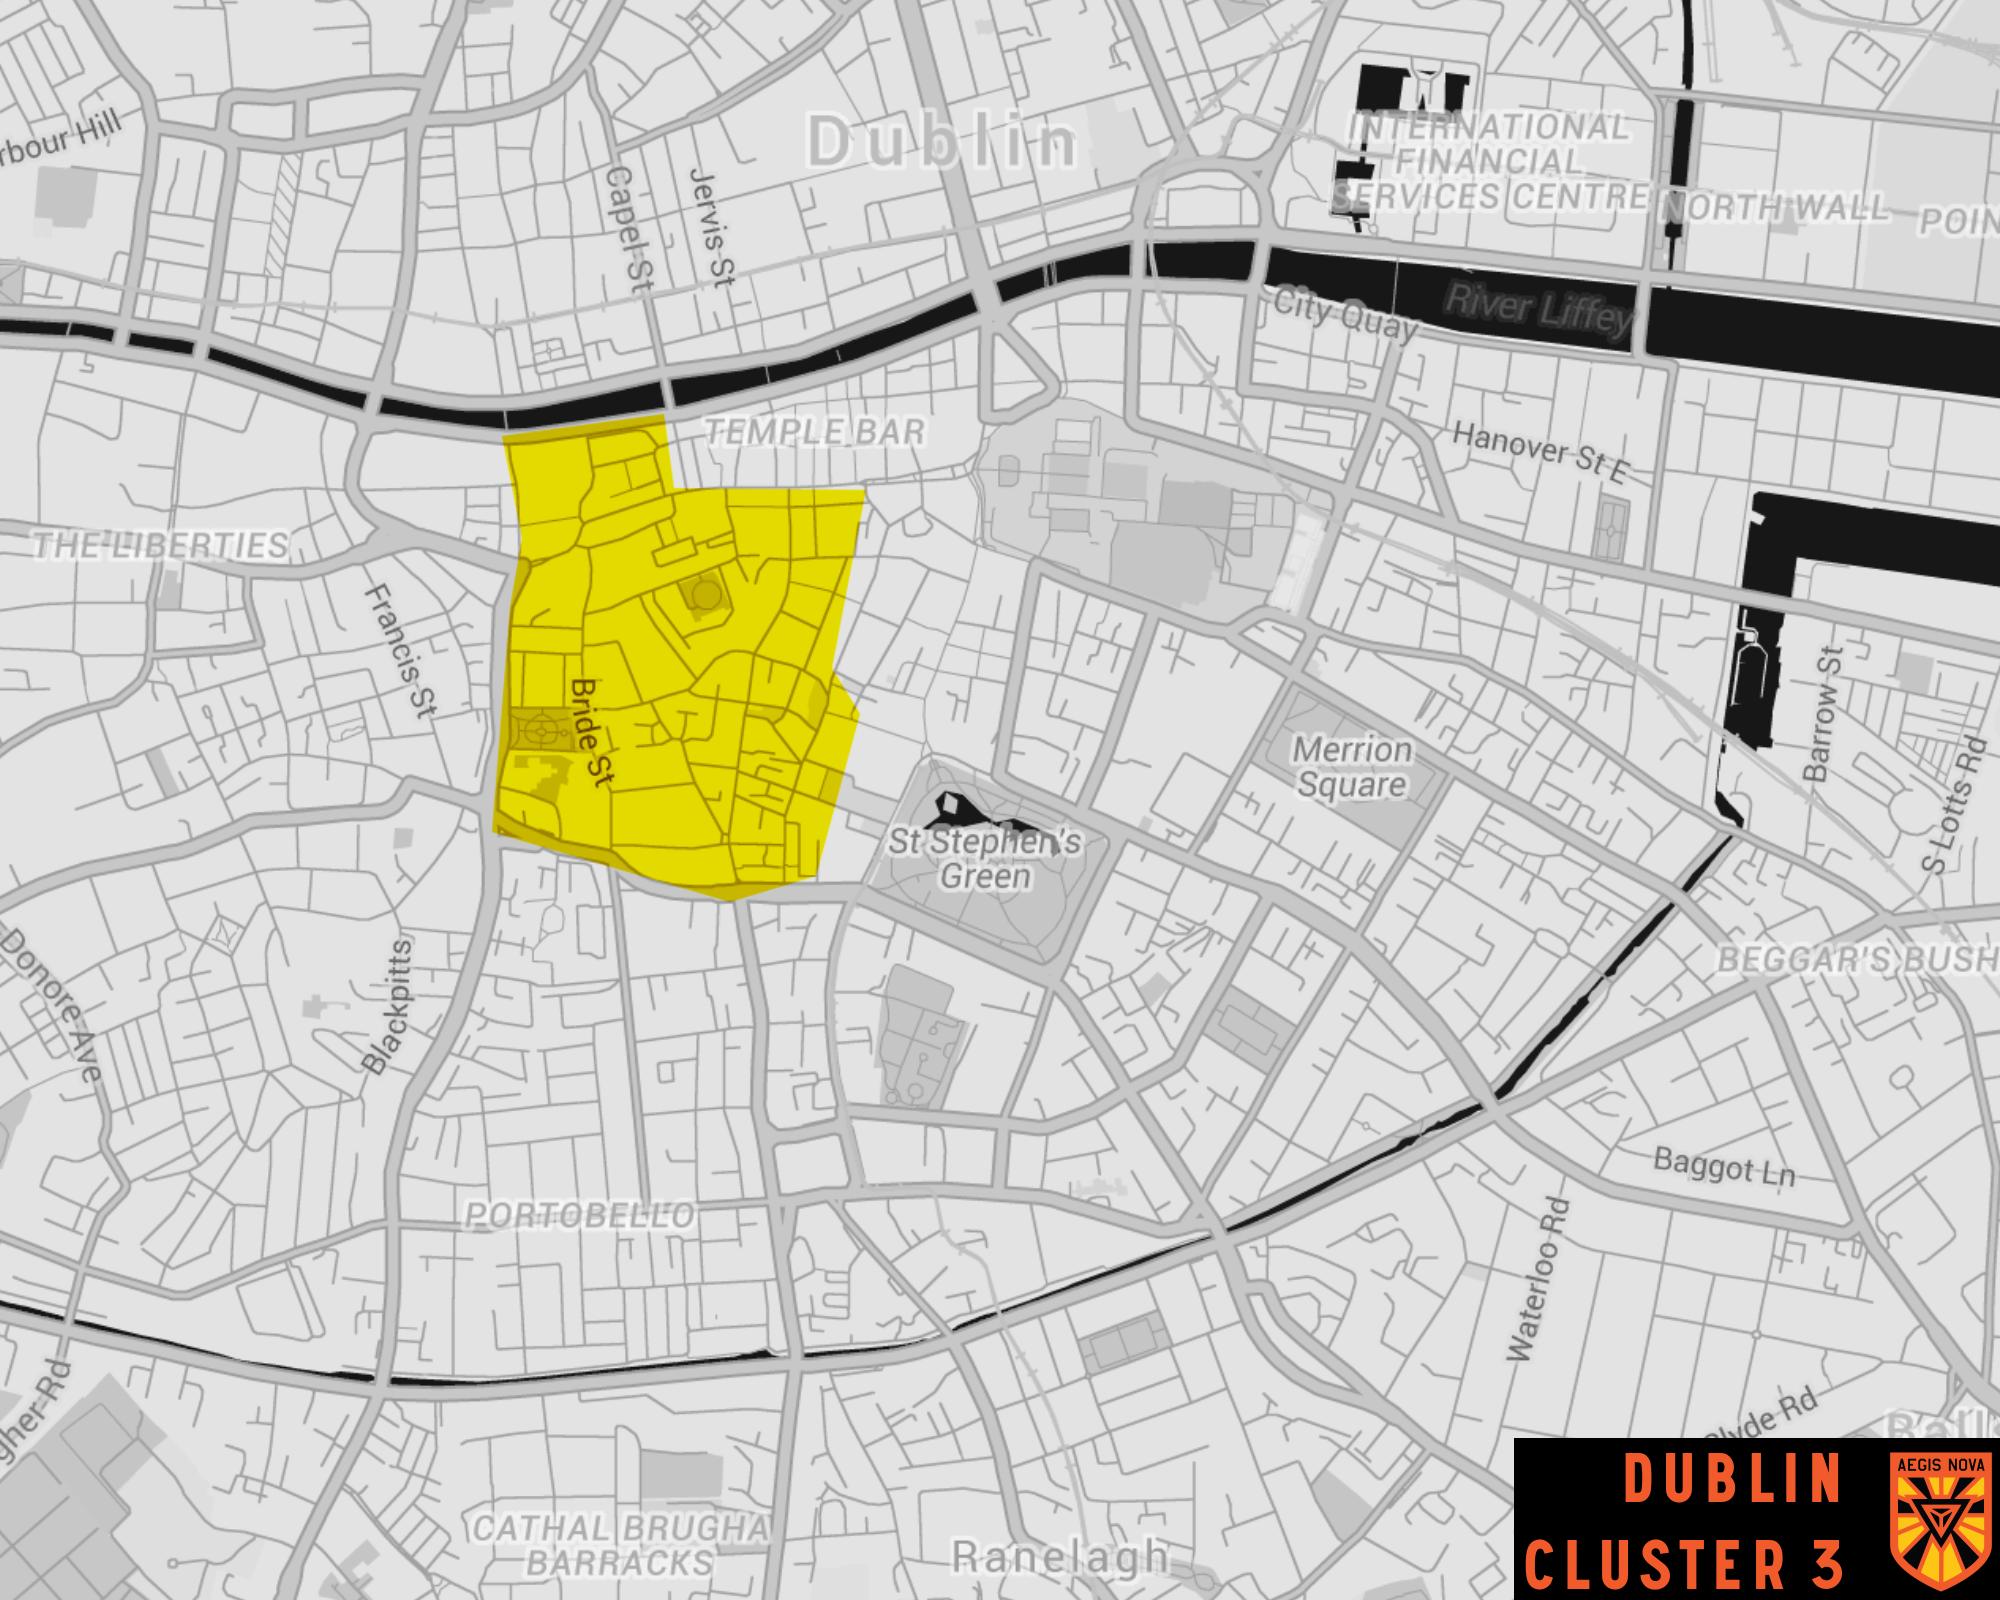 DublinCluster3.png